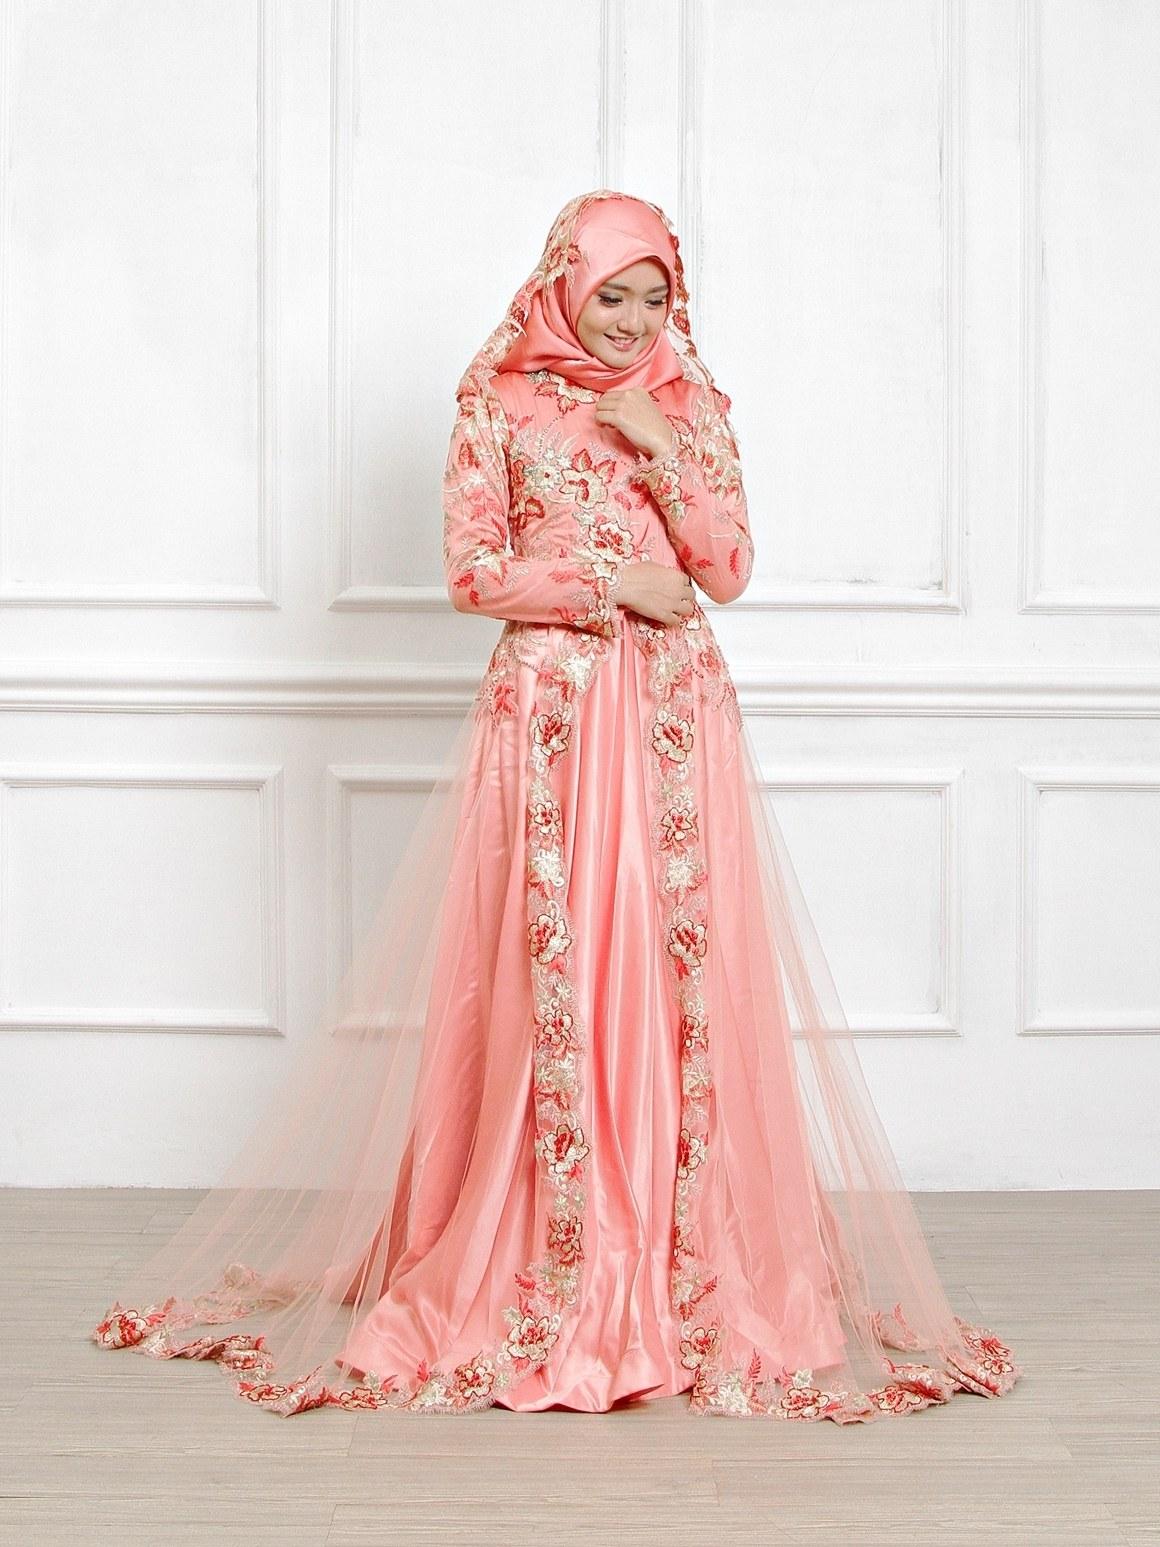 Bentuk Sewa Gaun Pengantin Muslimah Di solo Dddy Gaun Pengantin Muslimah Dress Muslim Pungky Rumah Jahit